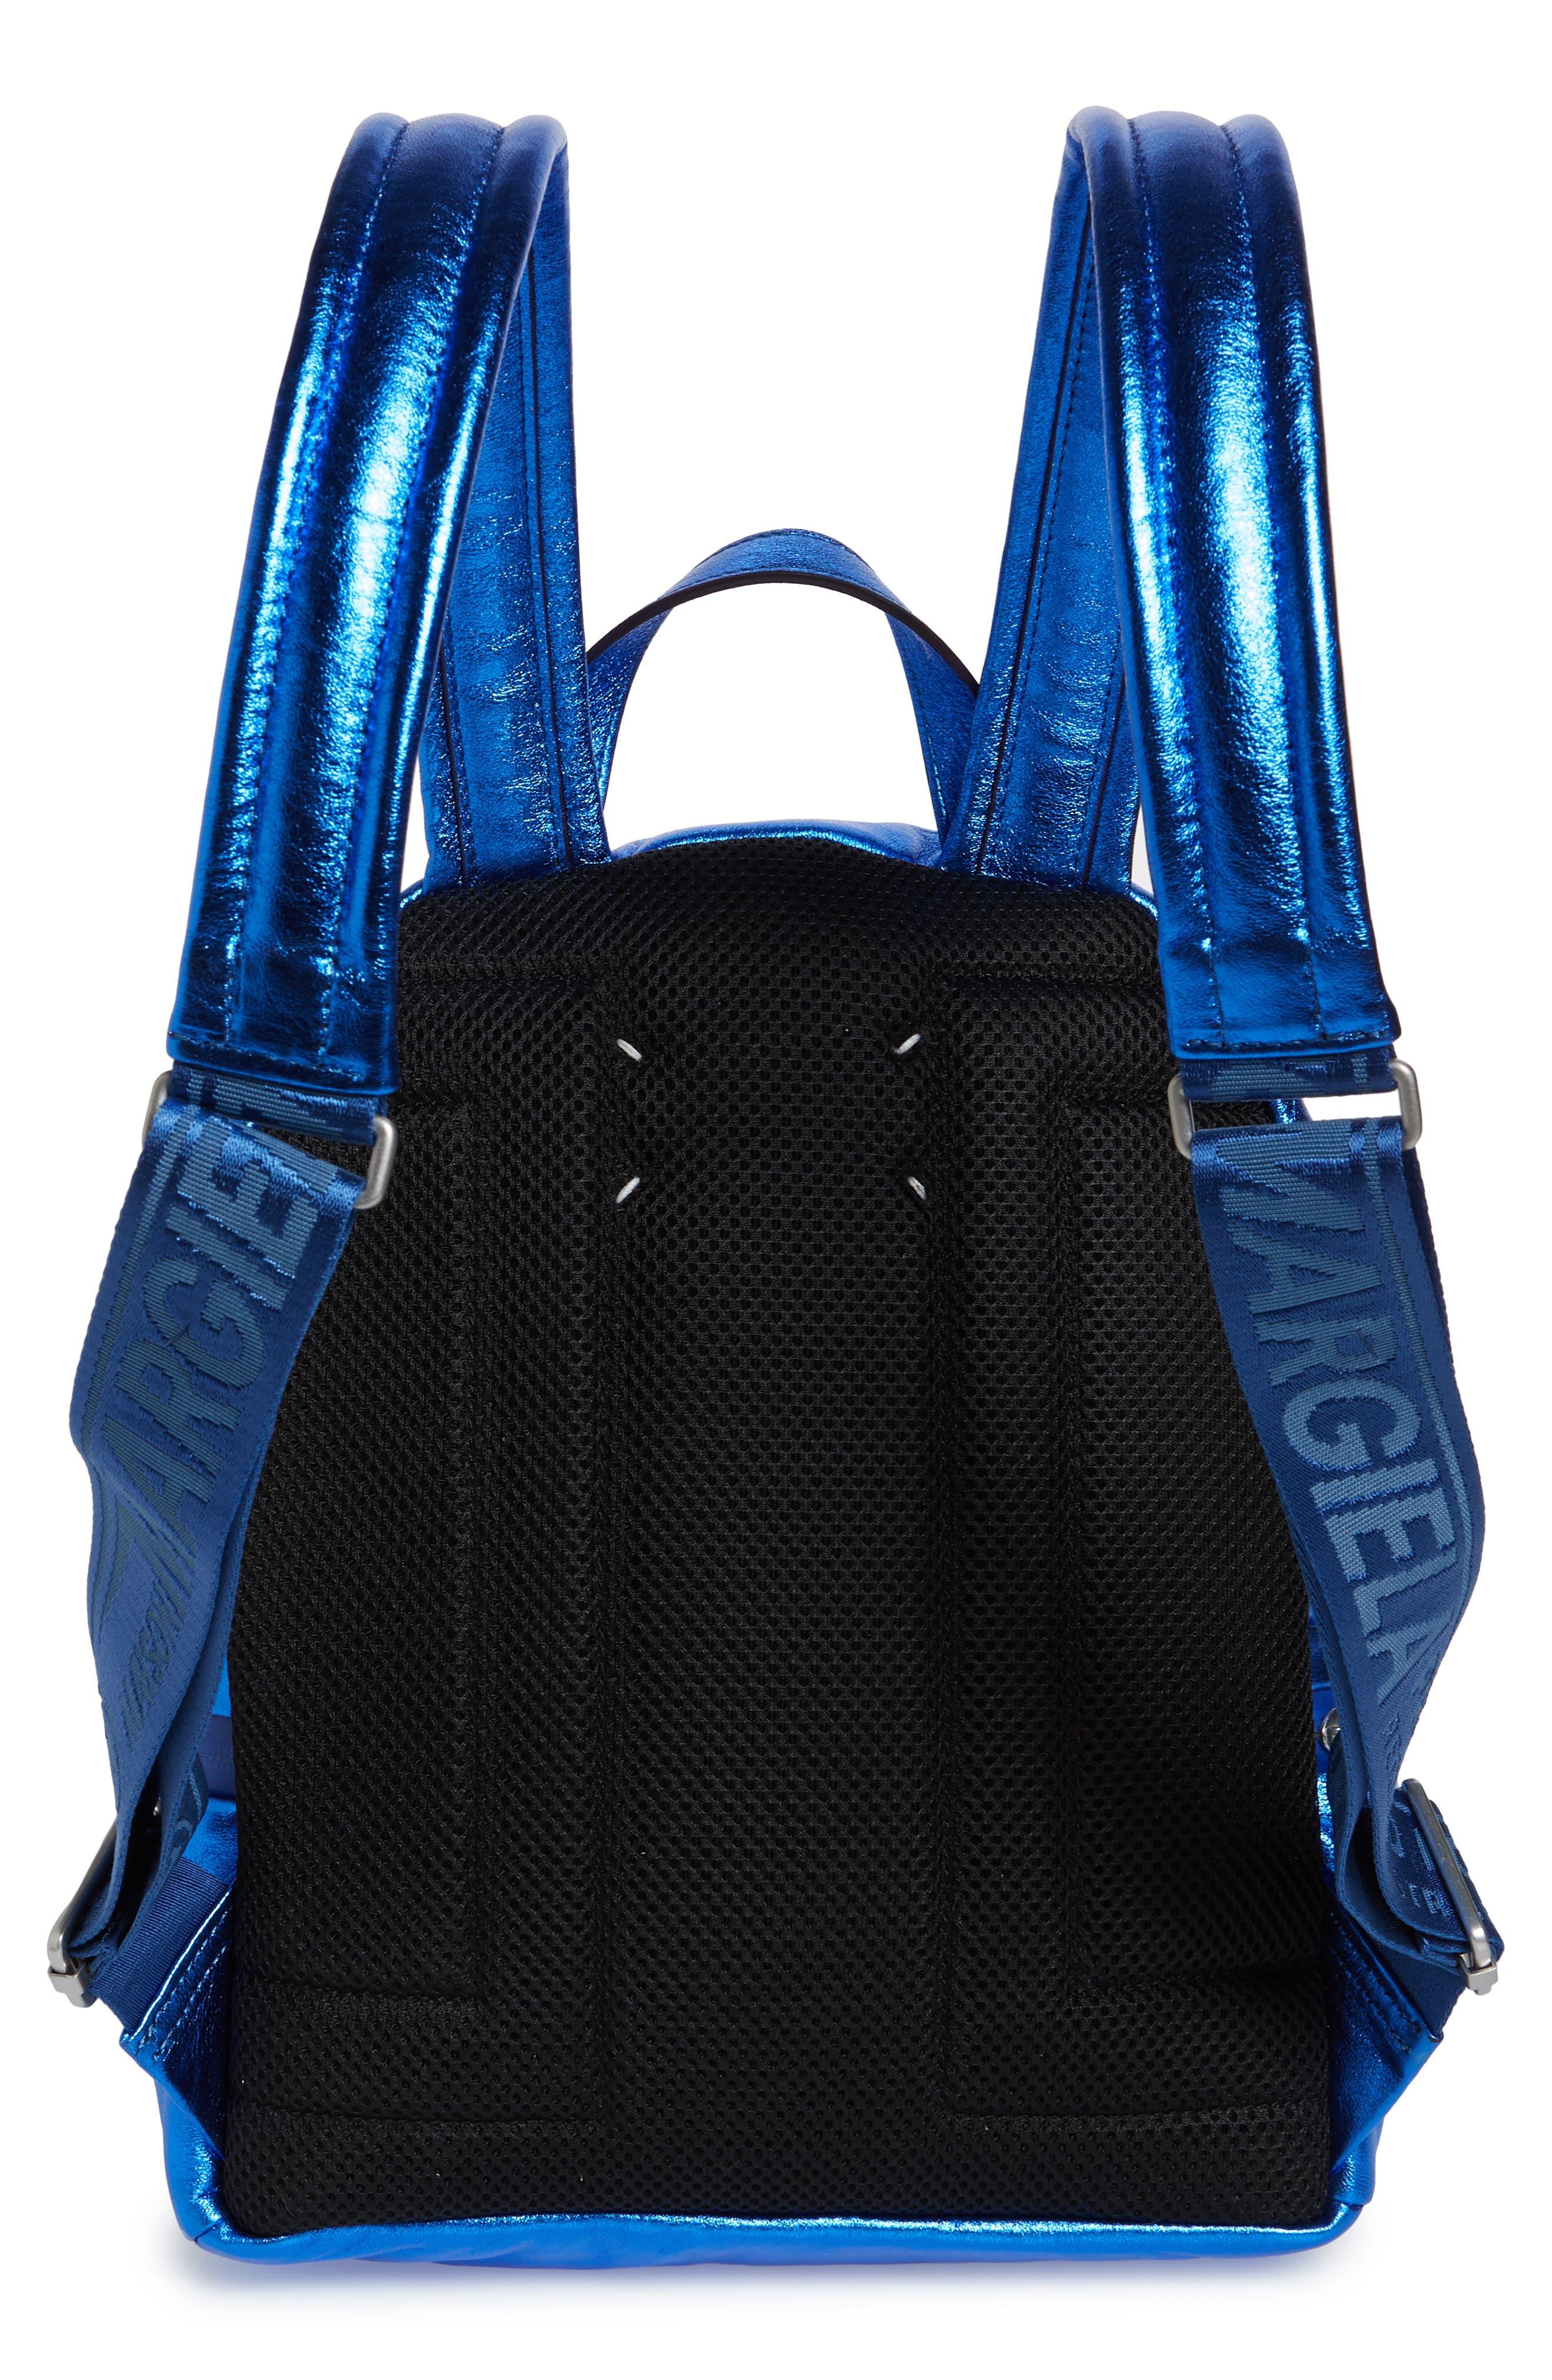 MAISON MARGIELA,                             Medium Number Print Backpack,                             Alternate thumbnail 3, color,                             DAZZLING BLUE